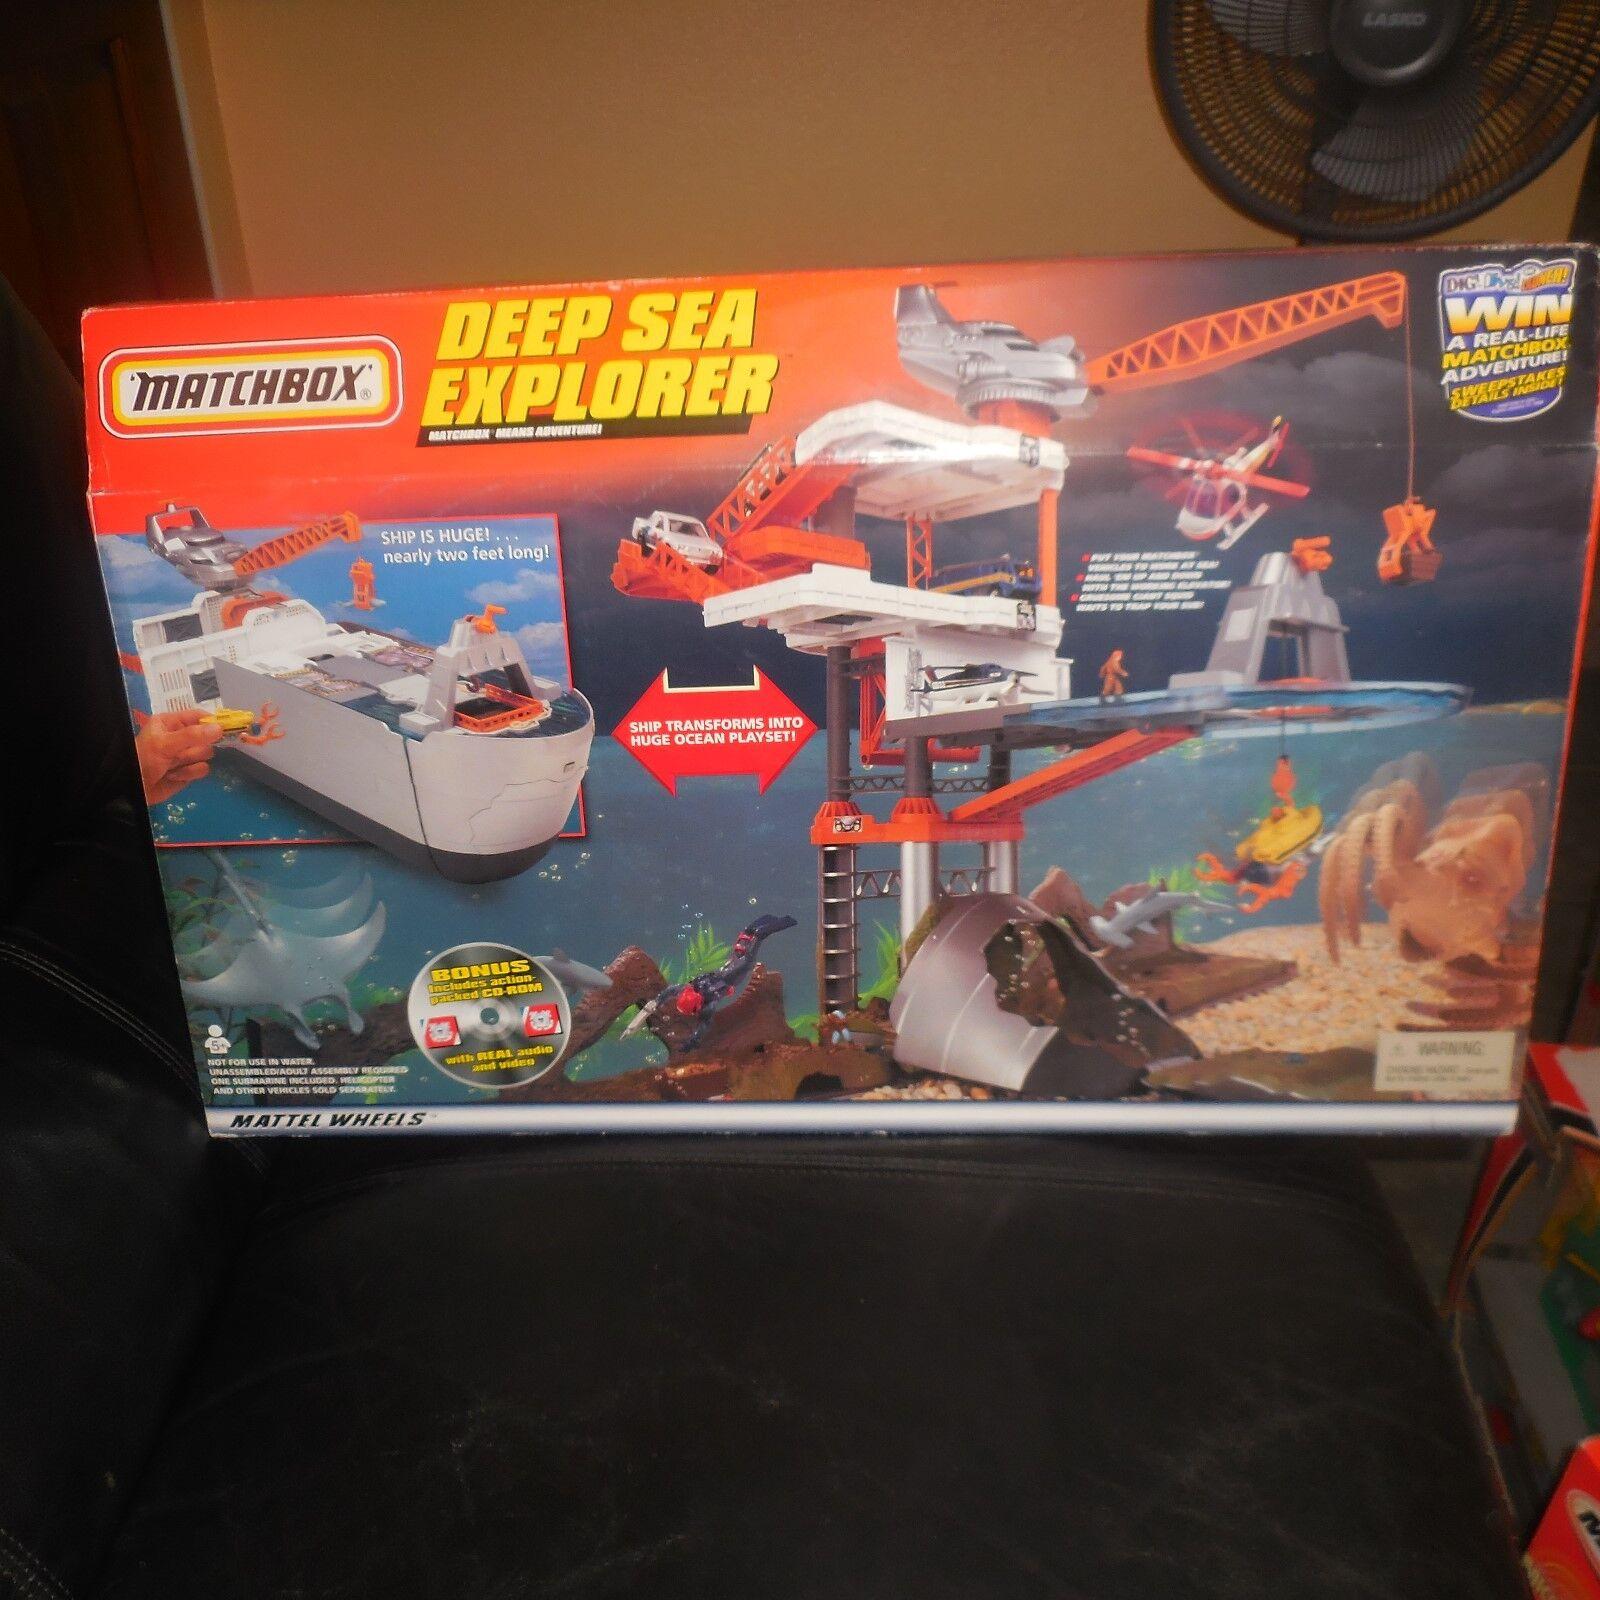 Raro 1999 Matchbox enorme 2' profundo mar Explorer Playset & Guardia Costera CD ROM Sellado